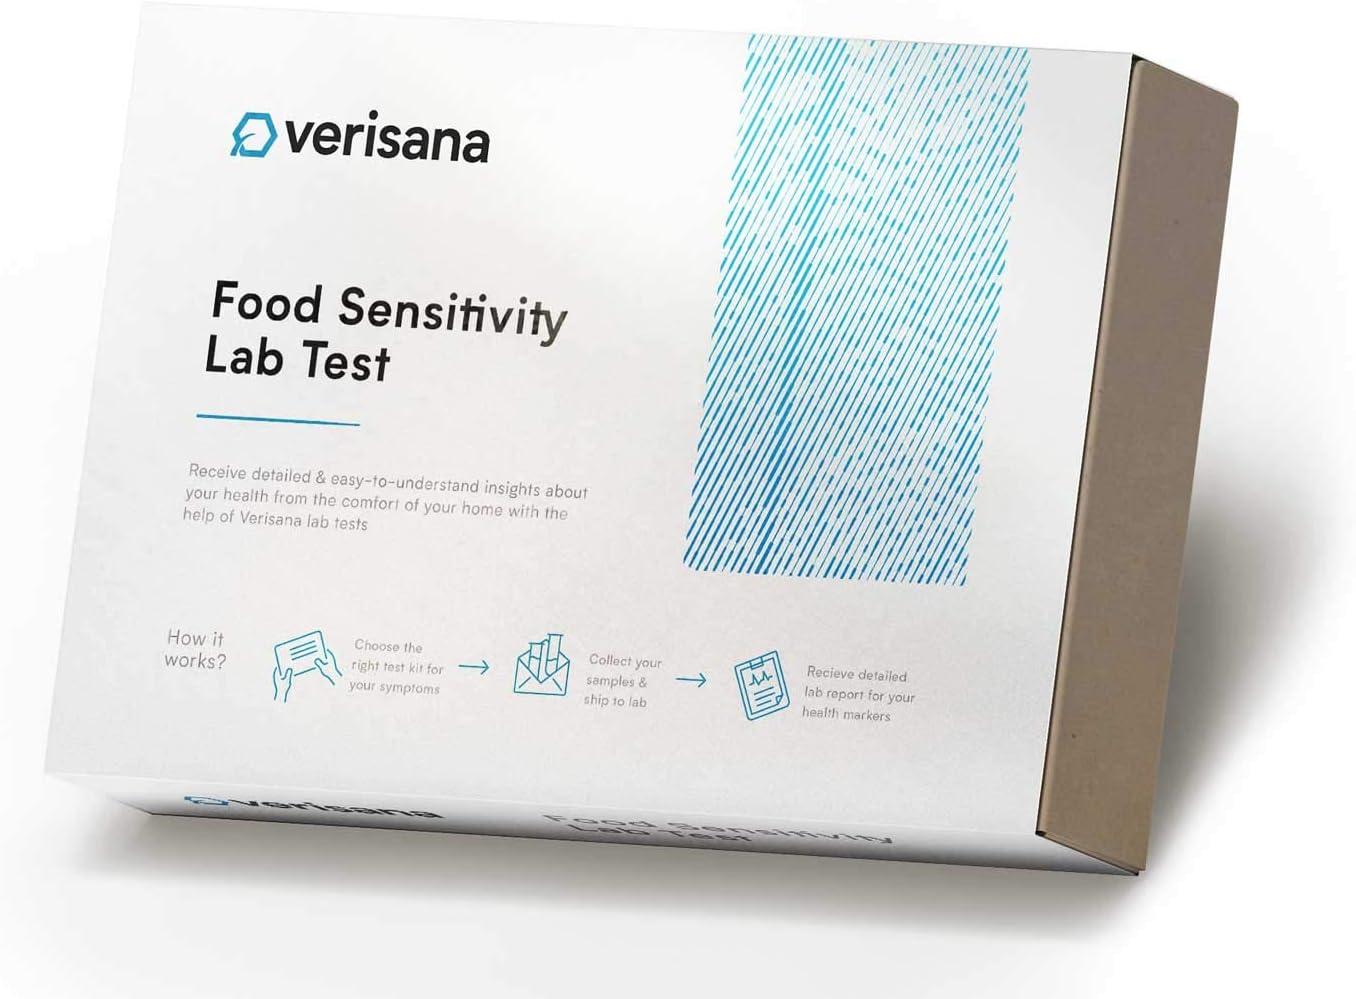 Food Sensitivity Test – 96 Foods Including Candida albicans – Verisana